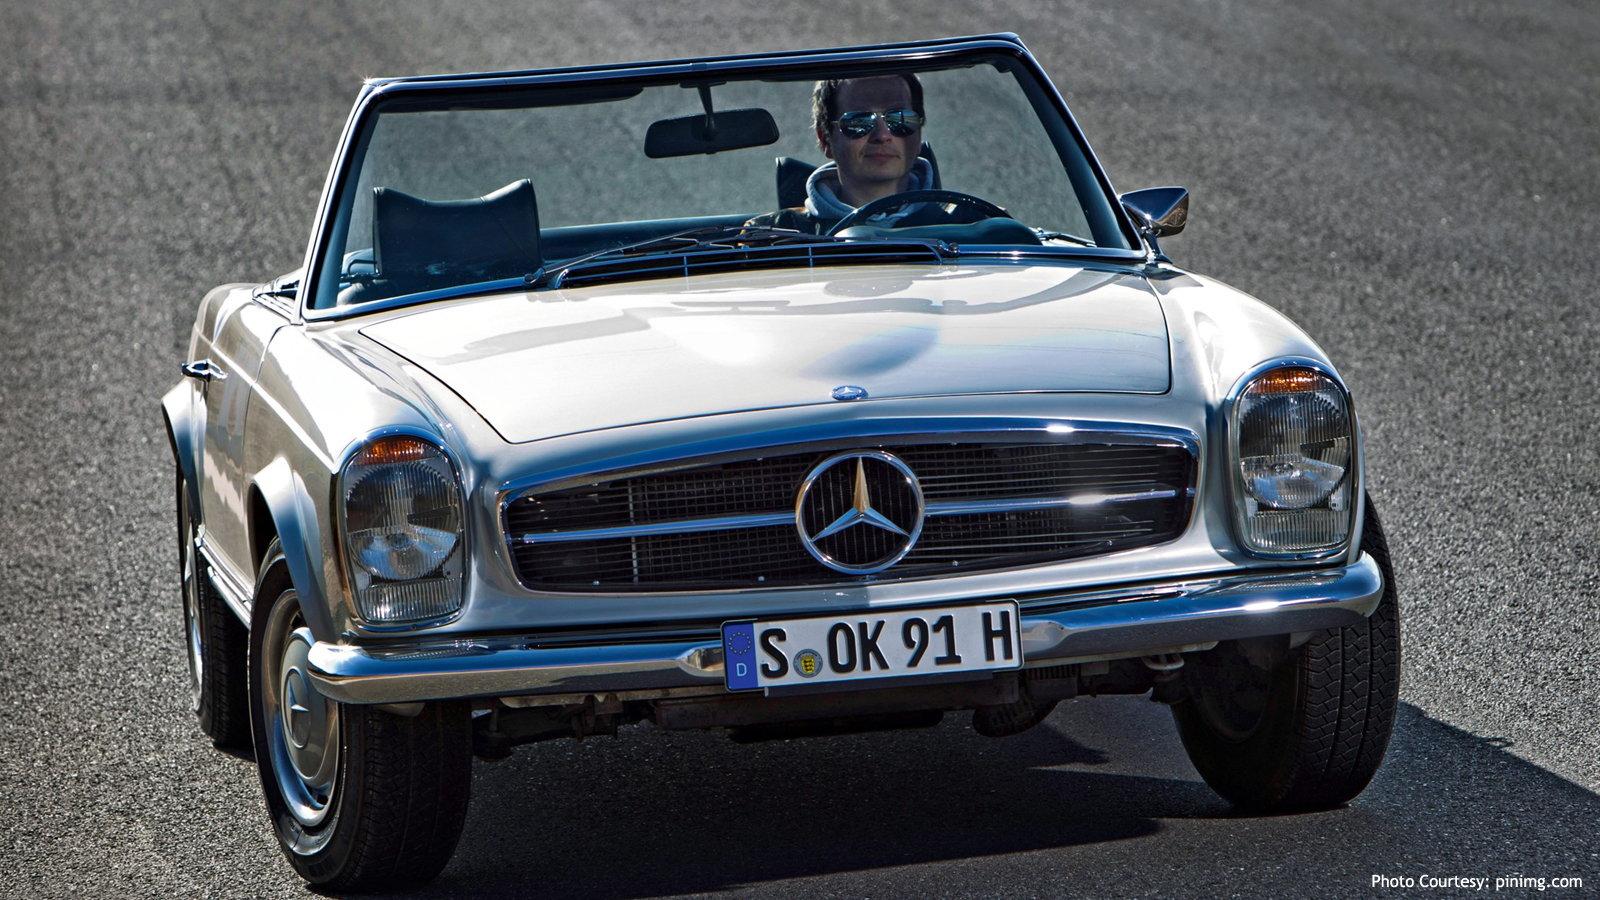 1967 Mercedes-Benz 280SL Pagoda